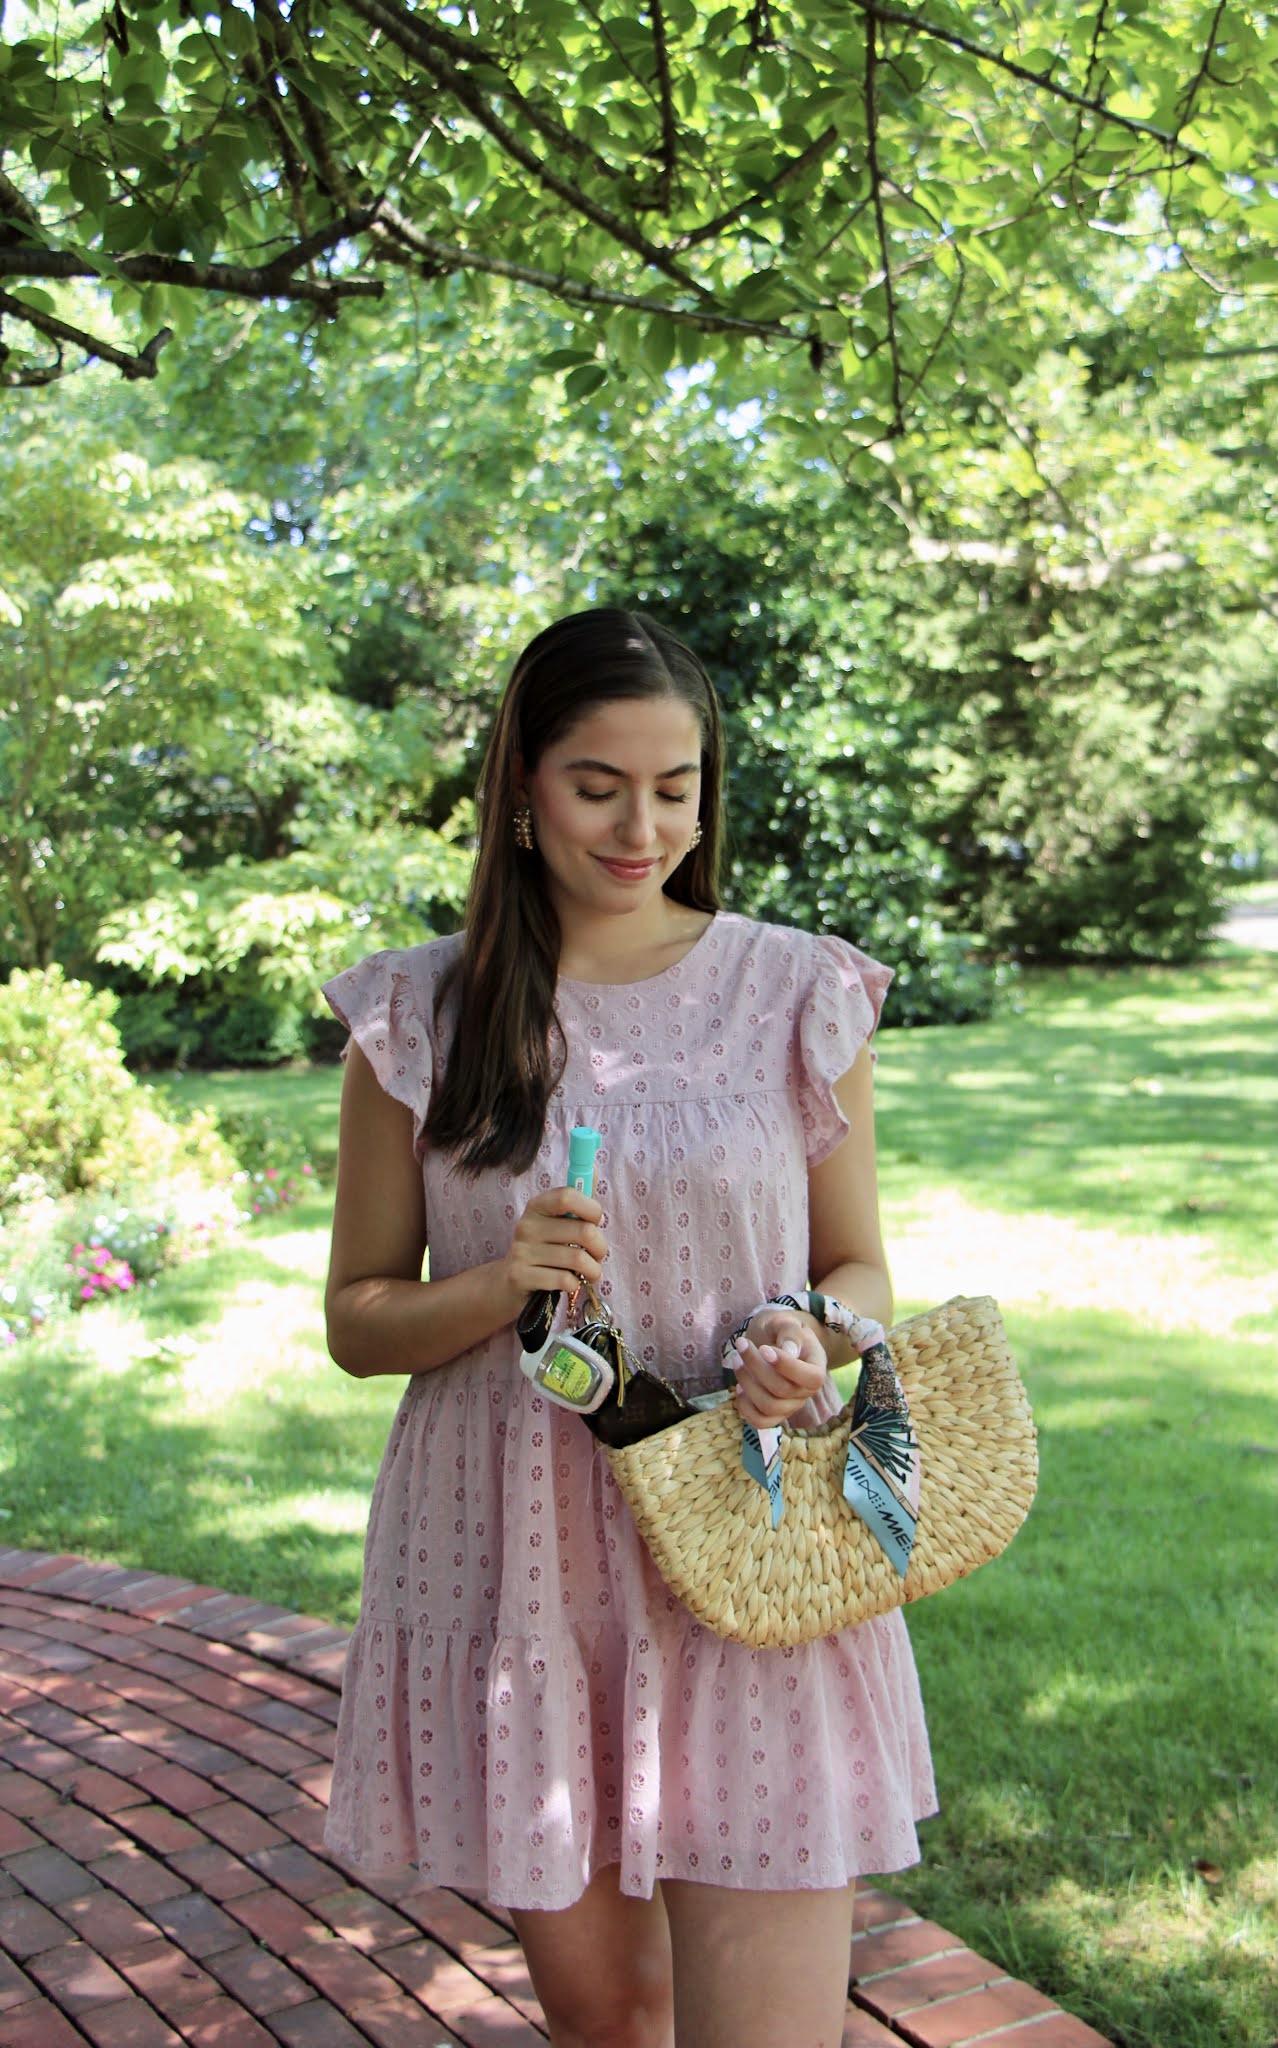 pink dress, straw bag, pepper spray